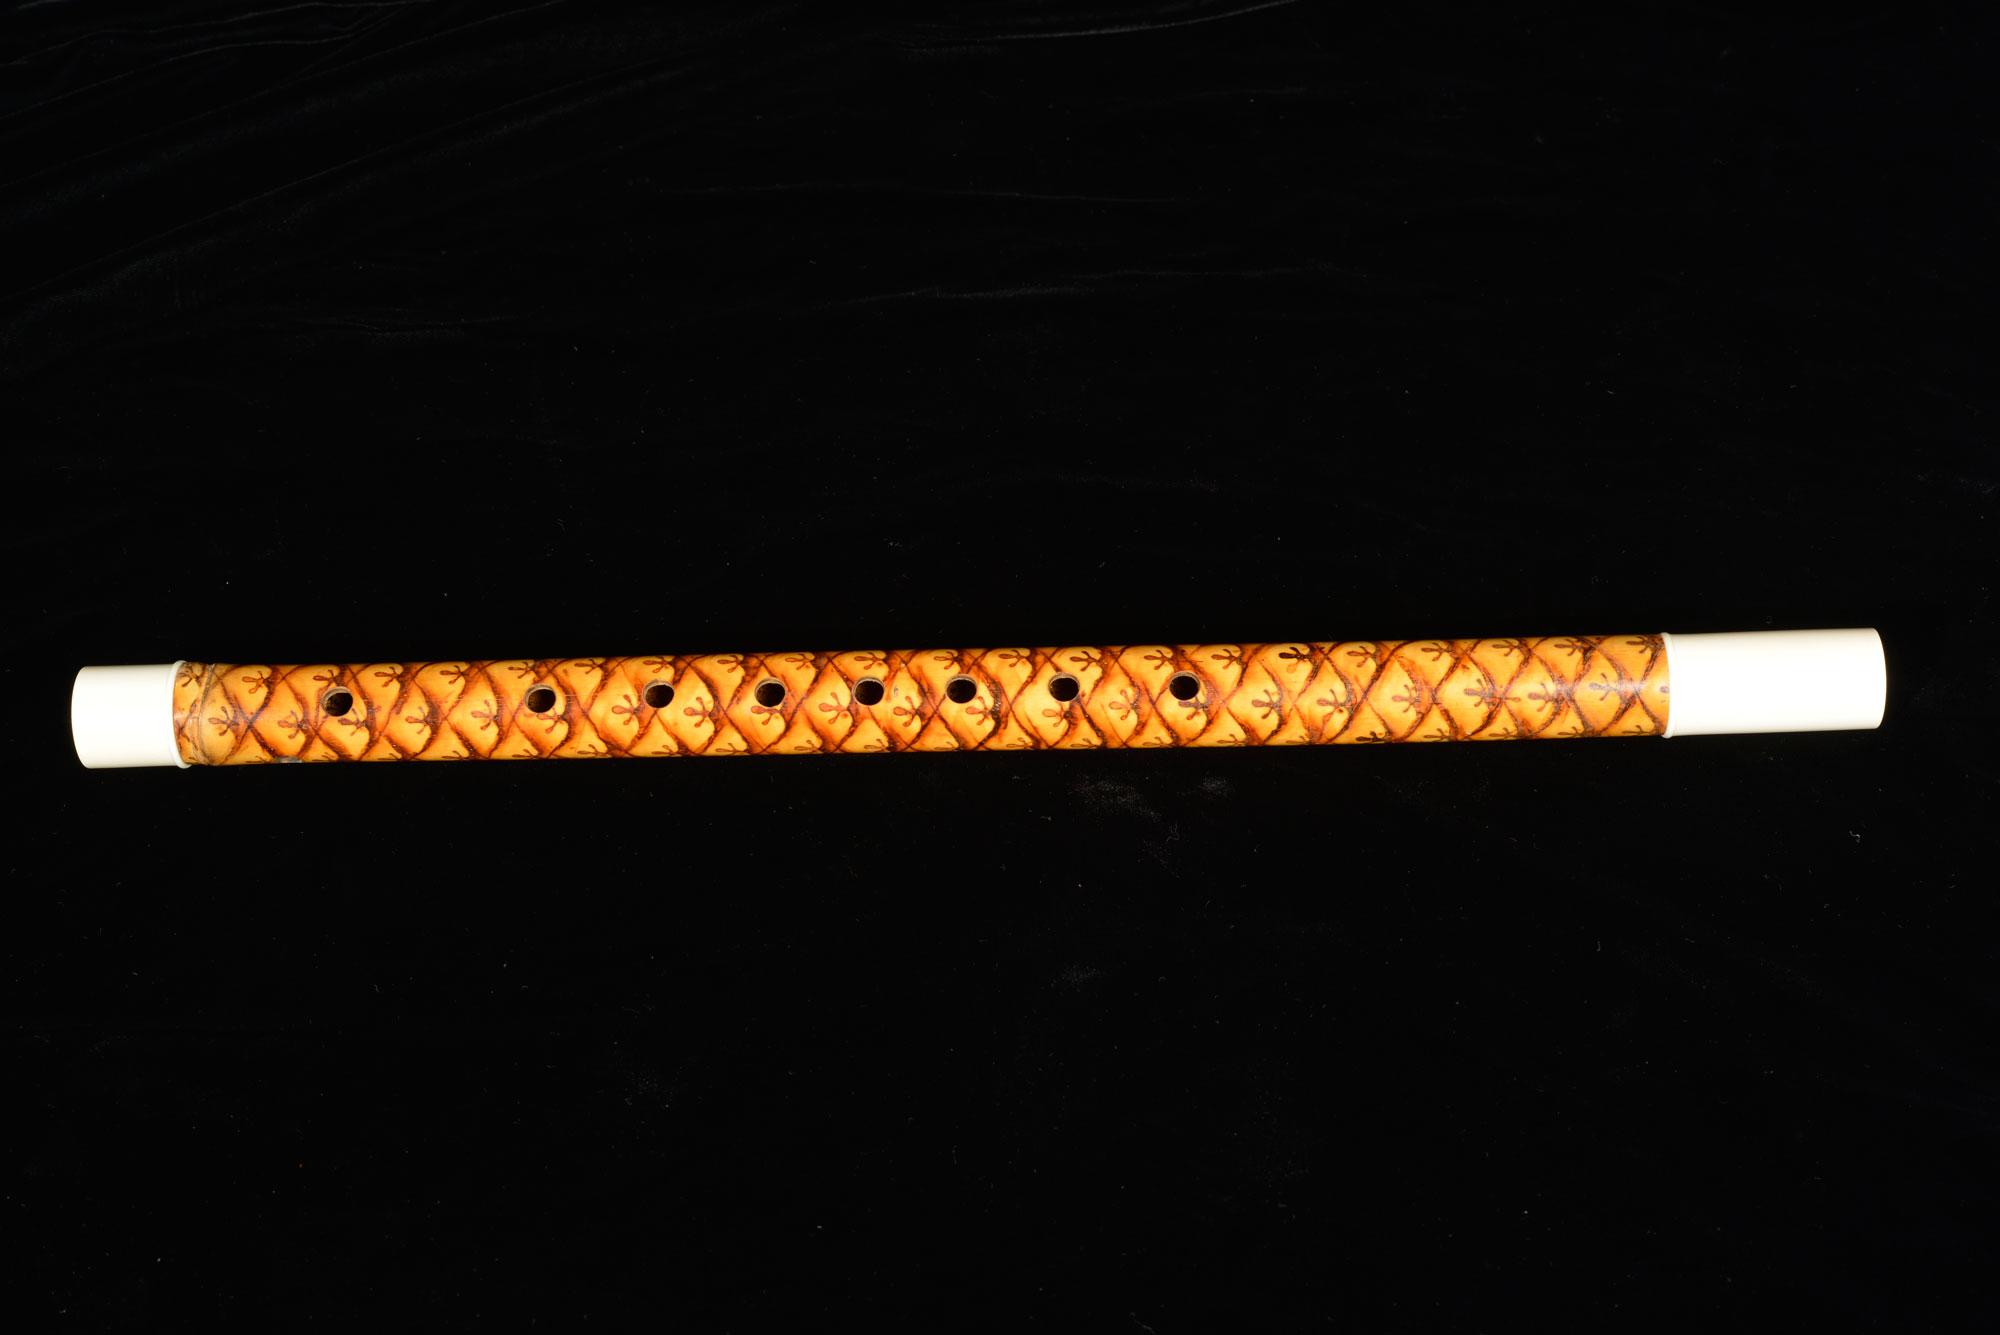 Flute (Khlui u) Gift from King Bhumibol Adulyadej to the Library of Congress, 1960 45 cm length Courtesy of the Library of Congress; 5137-L 2  ขลุ่ยอู้ ของขวัญพระราชทานจากพระบาทสมเด็จพระปรมินทรมหาภูมิพลอดุลยเดช แก่หอสมุดรัฐสภาสหรัฐอเมริกา พ.ศ. ๒๕๐๓ ยาว ๔๕ ซม. ได้รับความอนุเคราะห์จากหอสมุดรัฐสภาสหรัฐอเมริกา; 5137-L 2